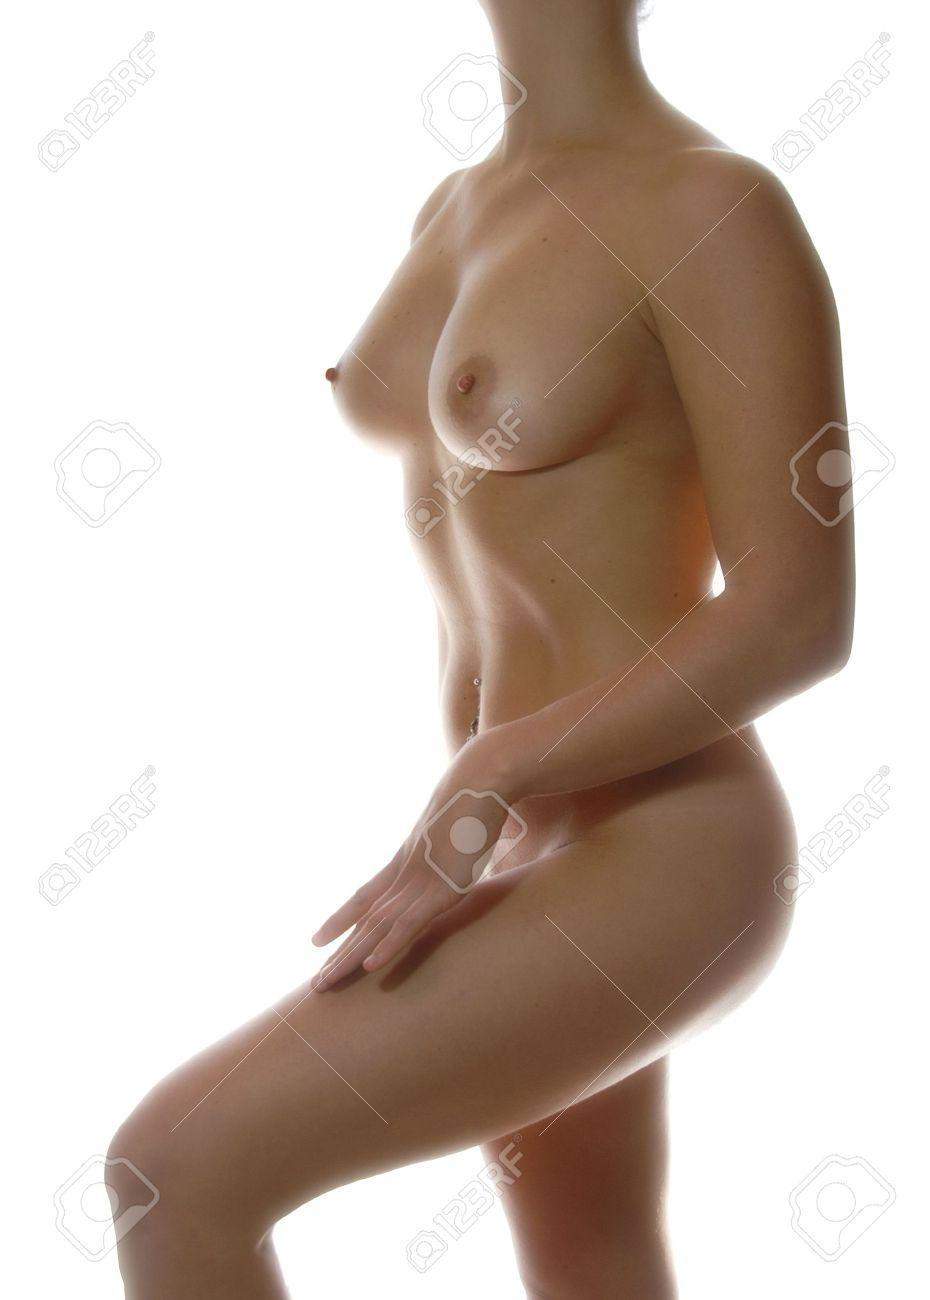 naked woman, beautiful, beauty, body, female, leaves, skin, anatomy